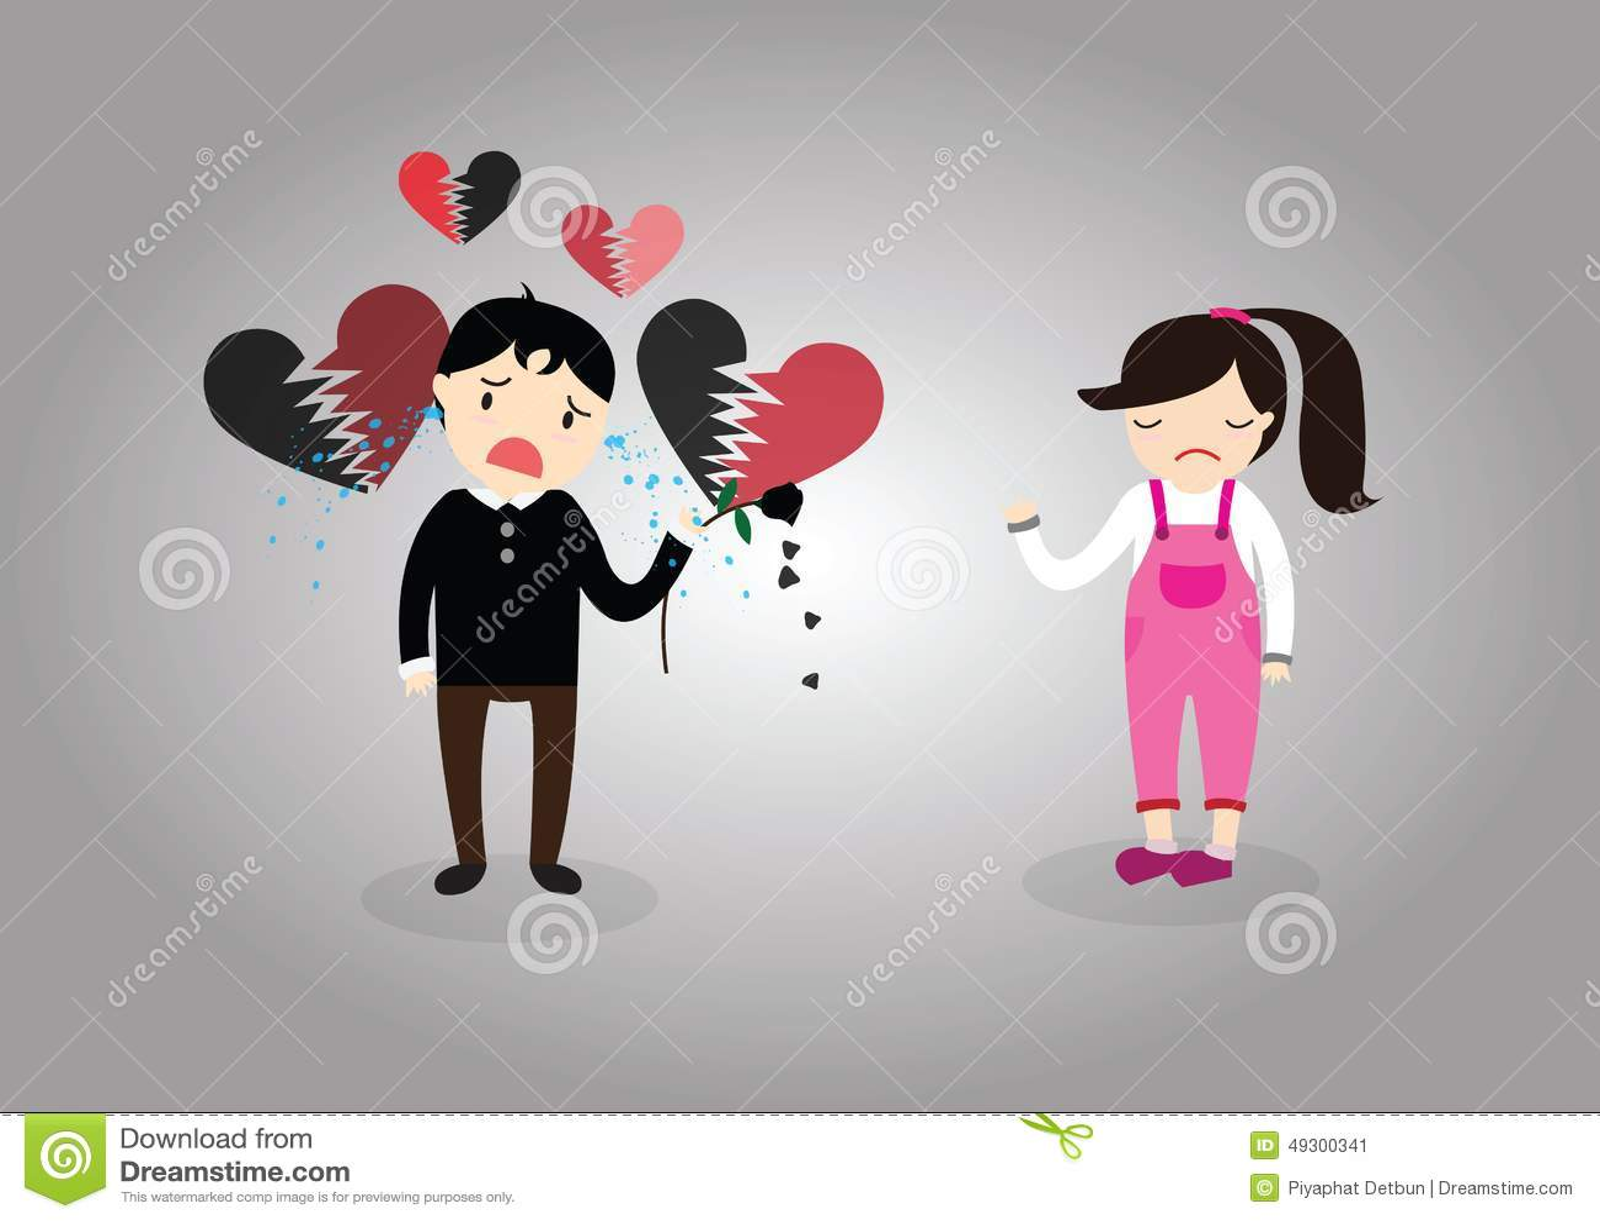 Heartbroken Illustration 49300341 Megapixl